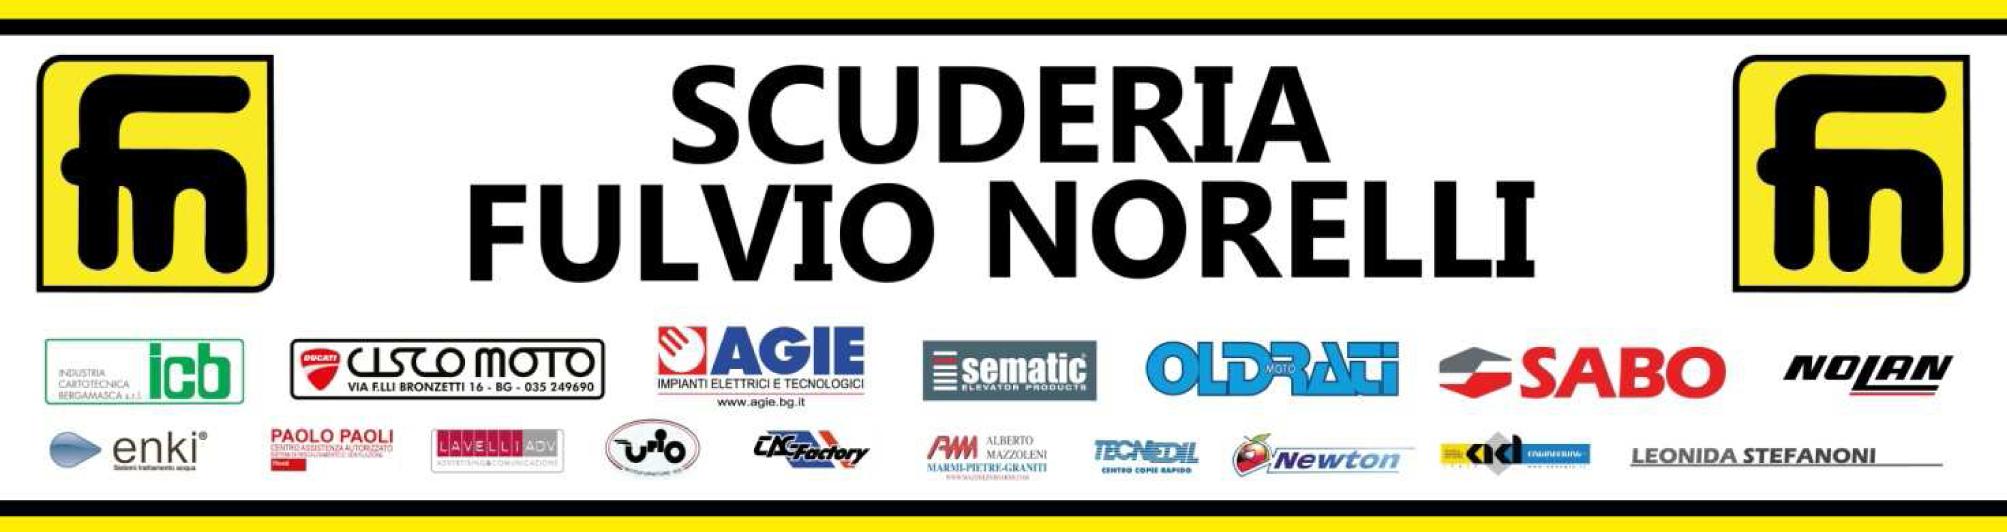 scuderia-logo